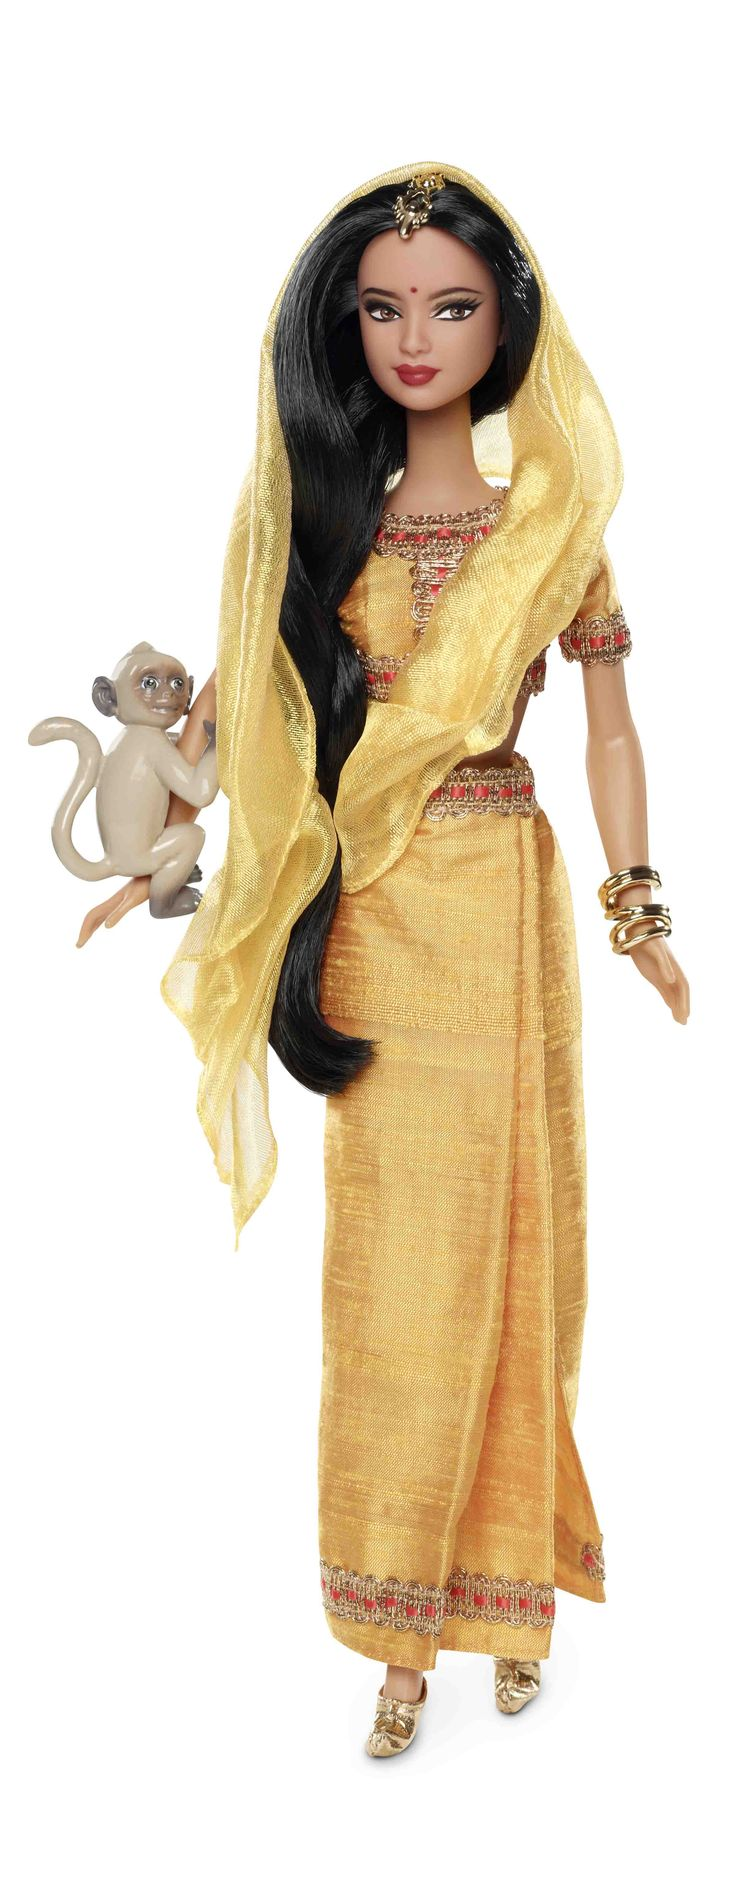 #Barbie of the #World. Barbie #India. http://zigzagmom.com/barbie-around-the-world/